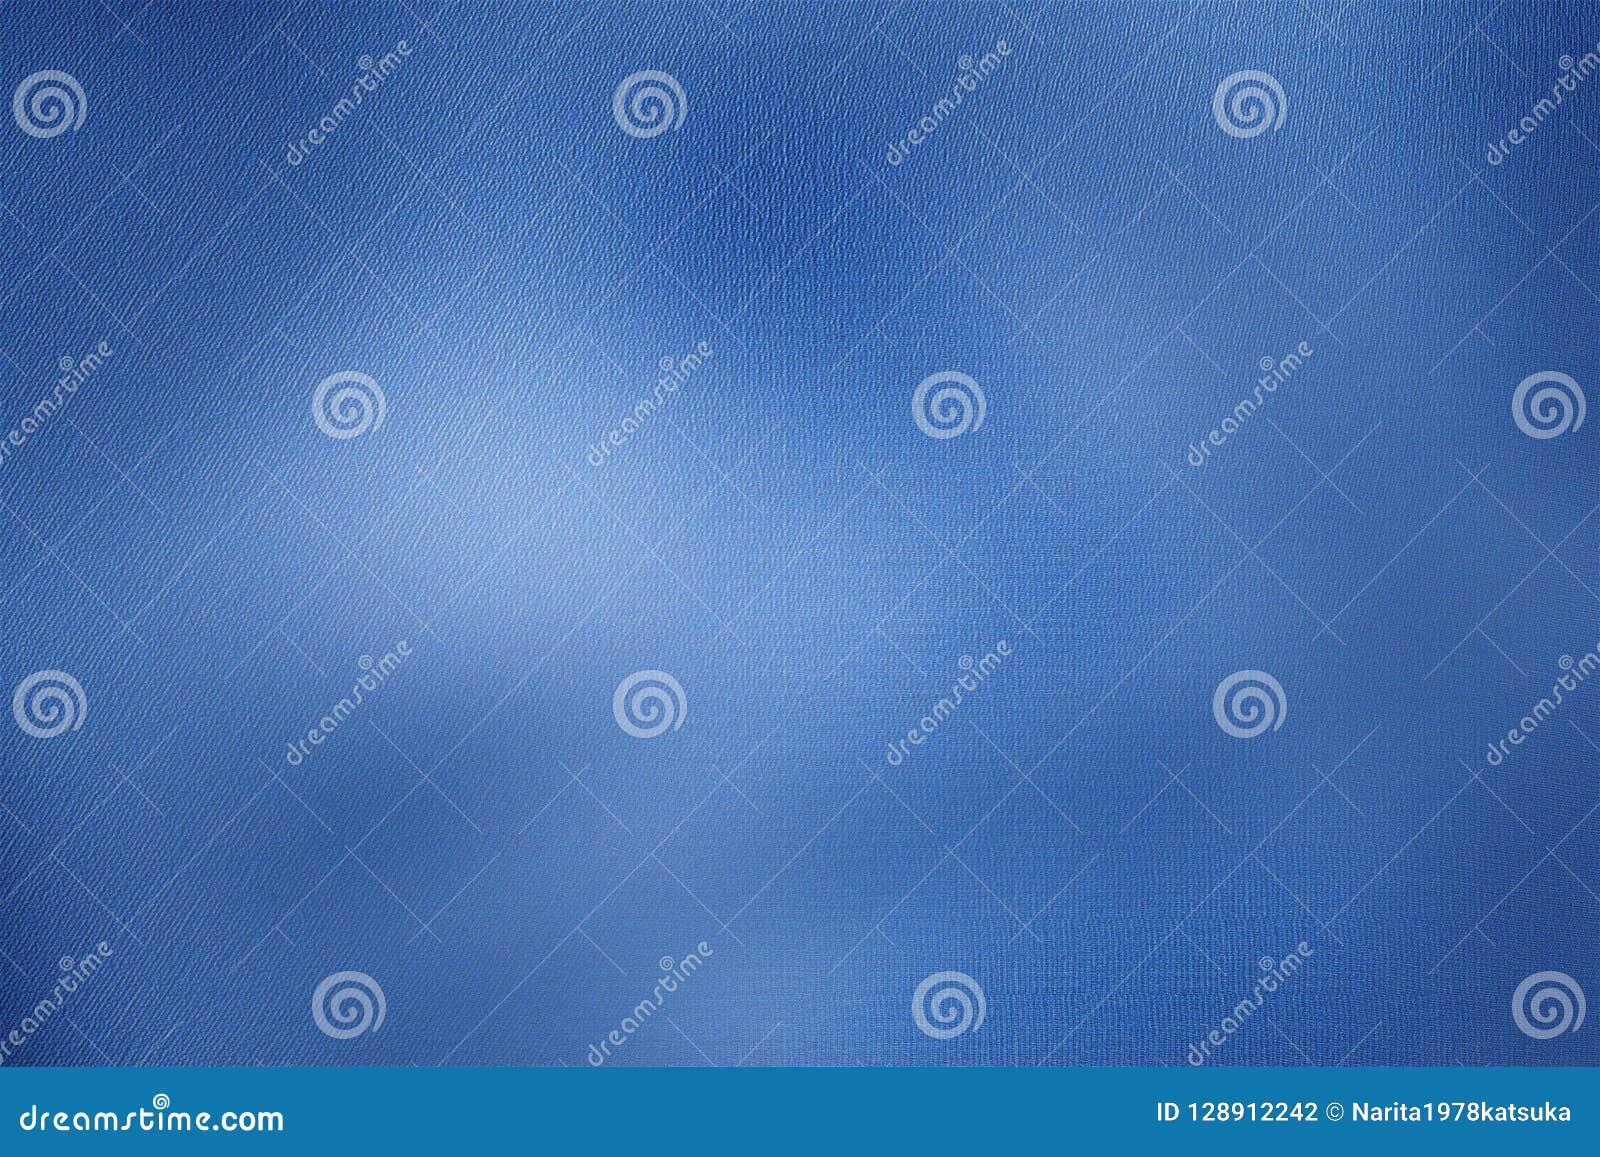 Unduh 970 Koleksi Background Hd Texture HD Terbaru